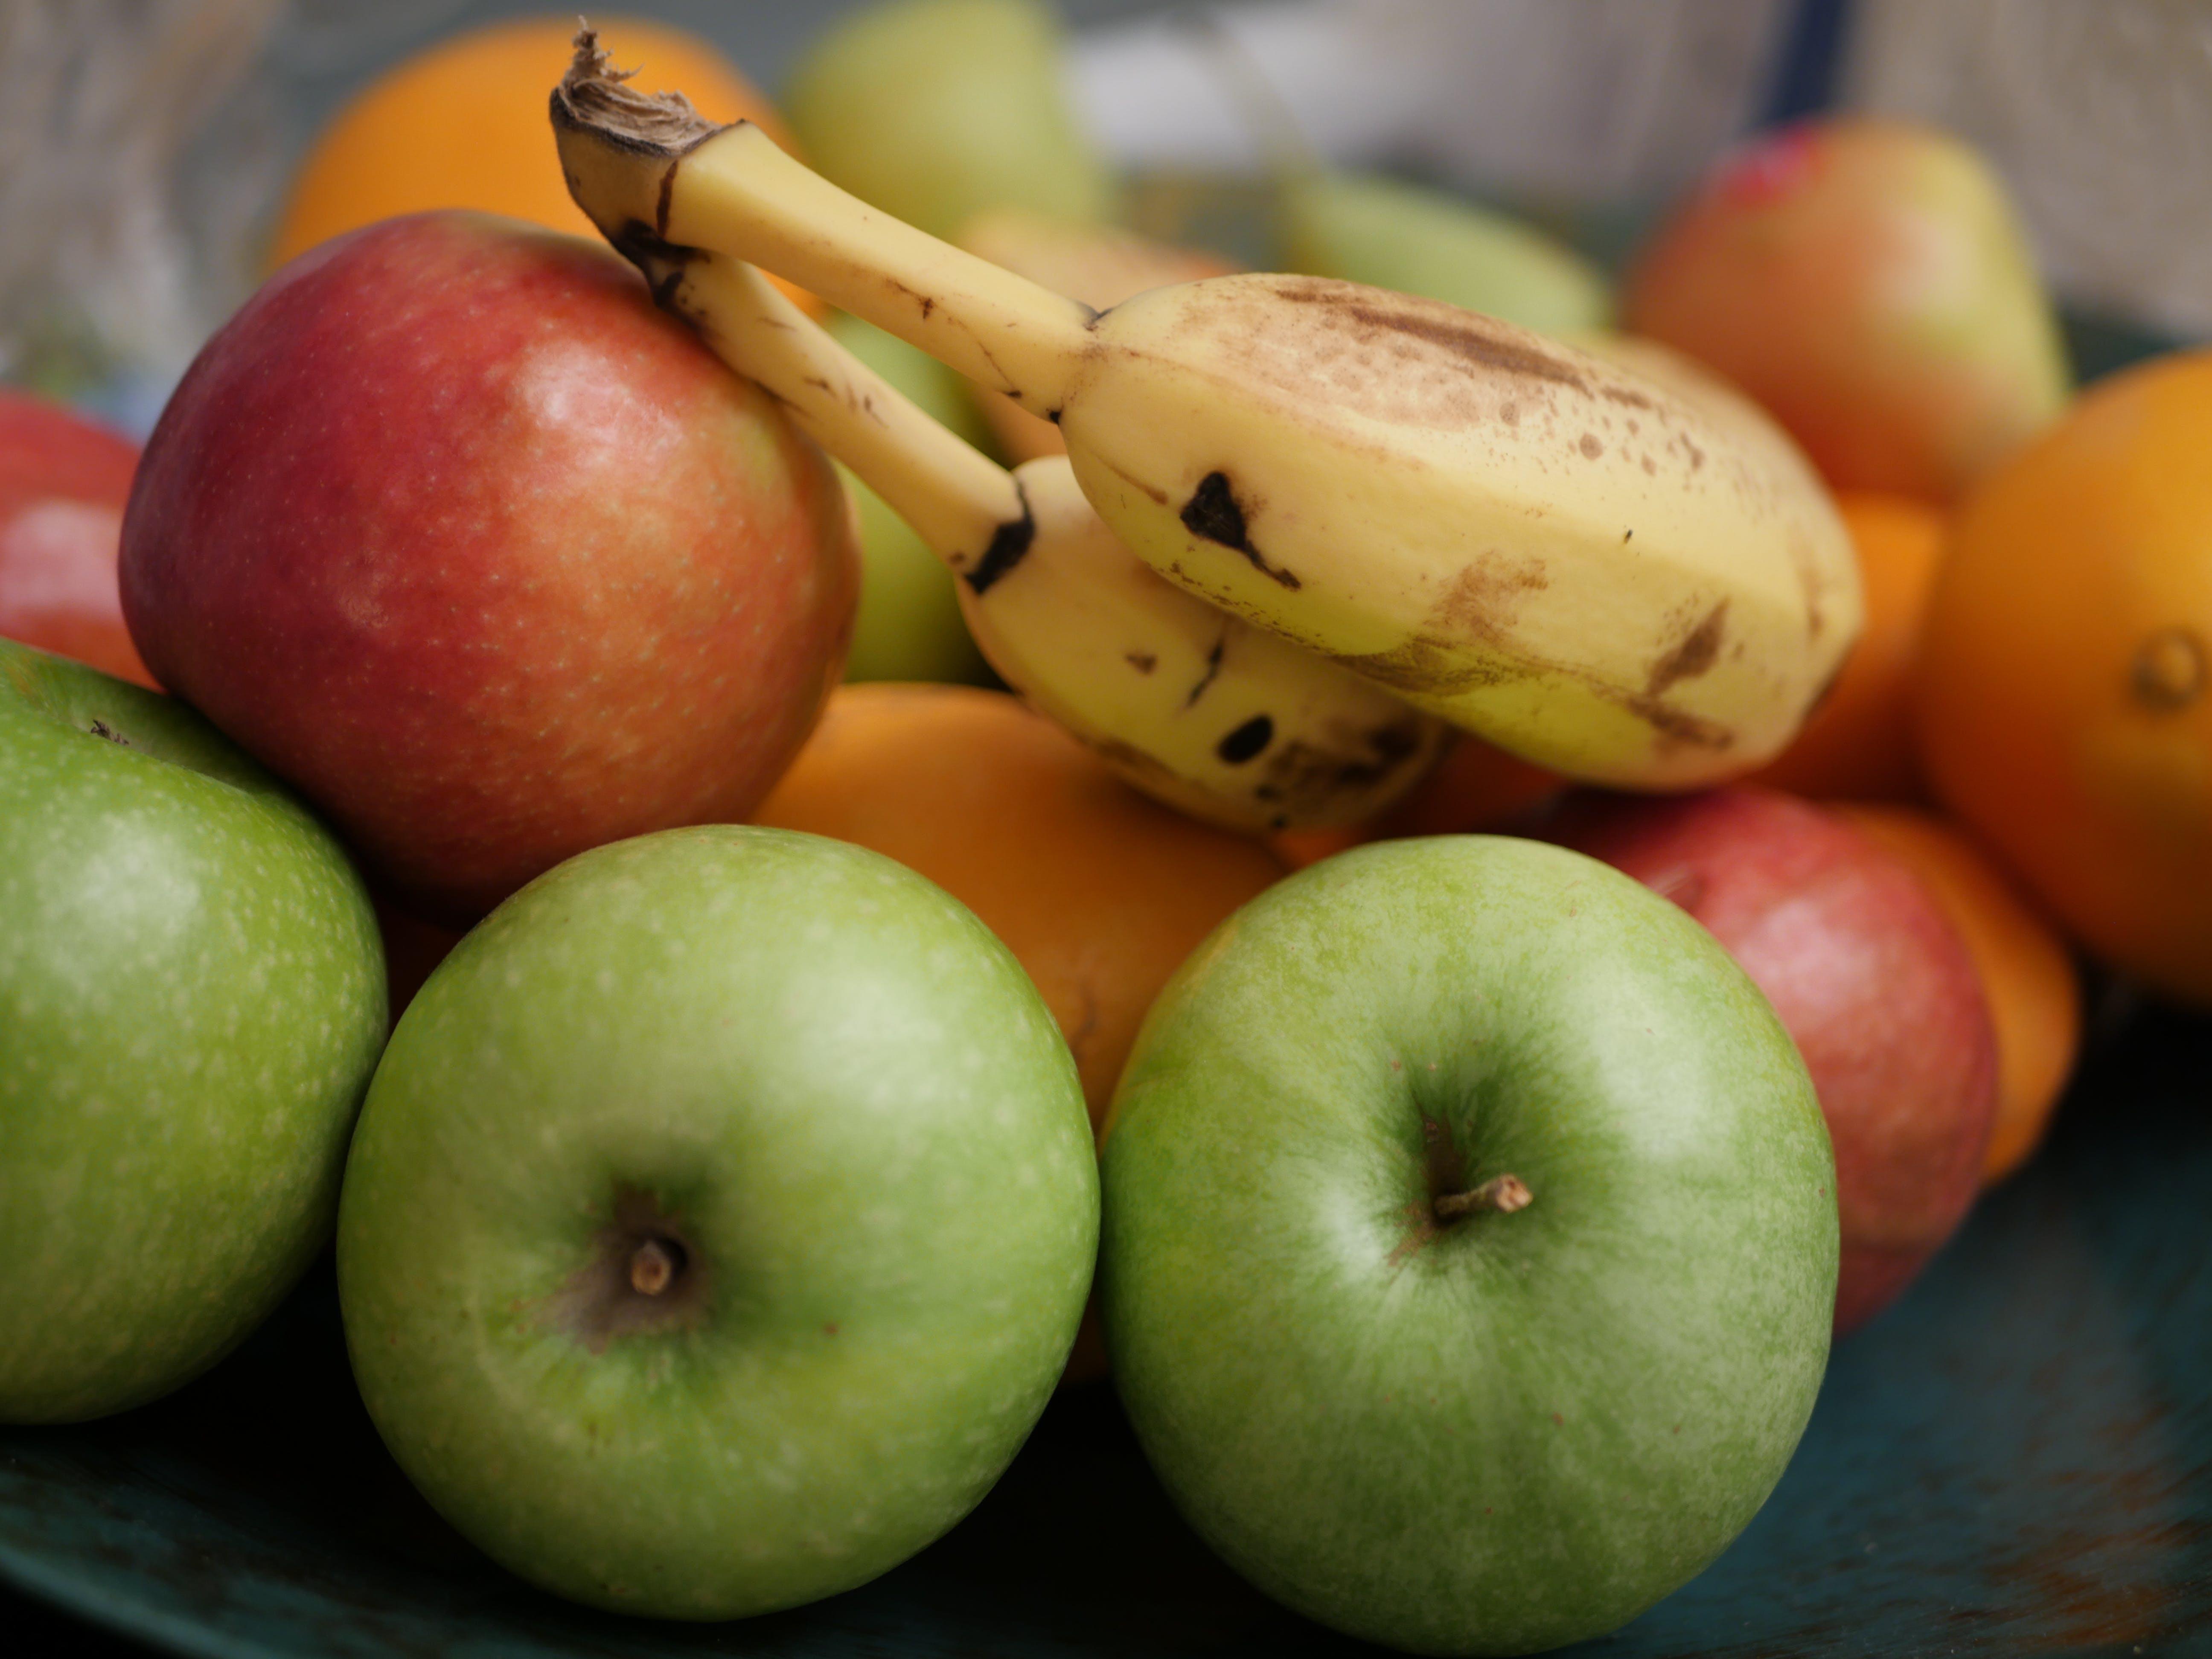 Free stock photo of apples, banana, bowl of fruit